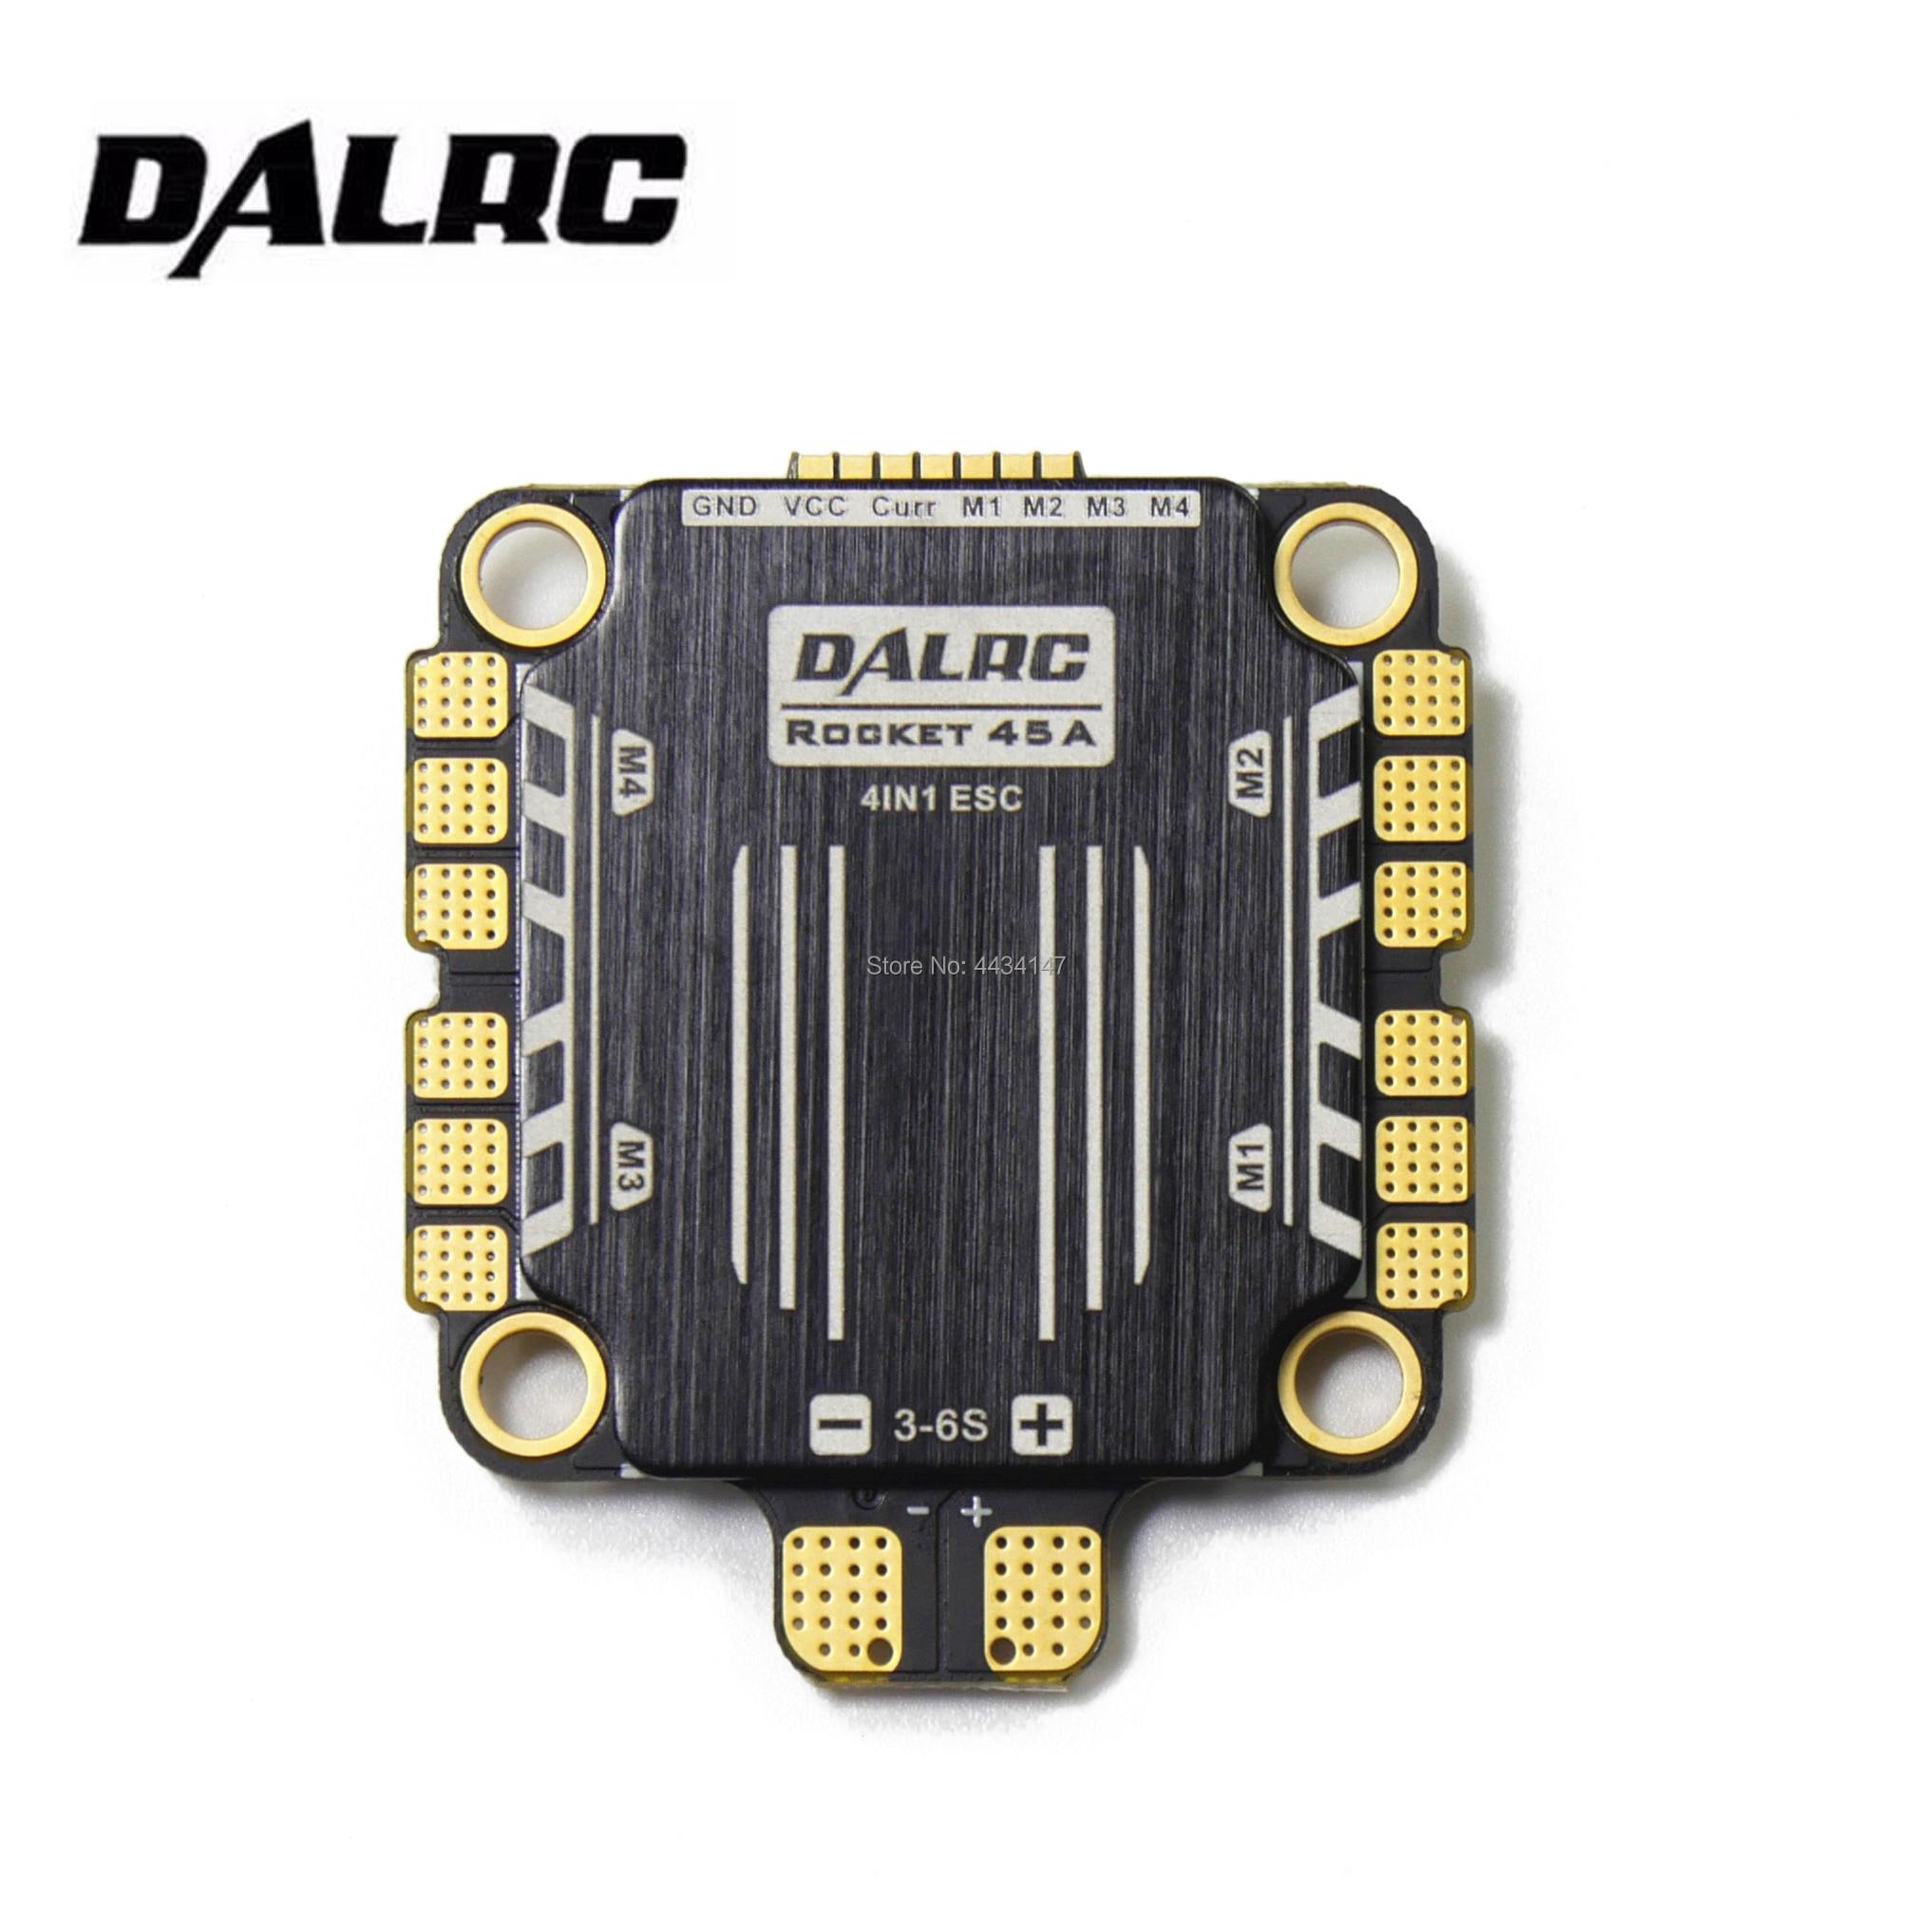 DALRC Rocket 45A 4IN1 ESC BLheli32 DShot1200 4 In 1 Brushless ESC STM32f051 solution ESC no